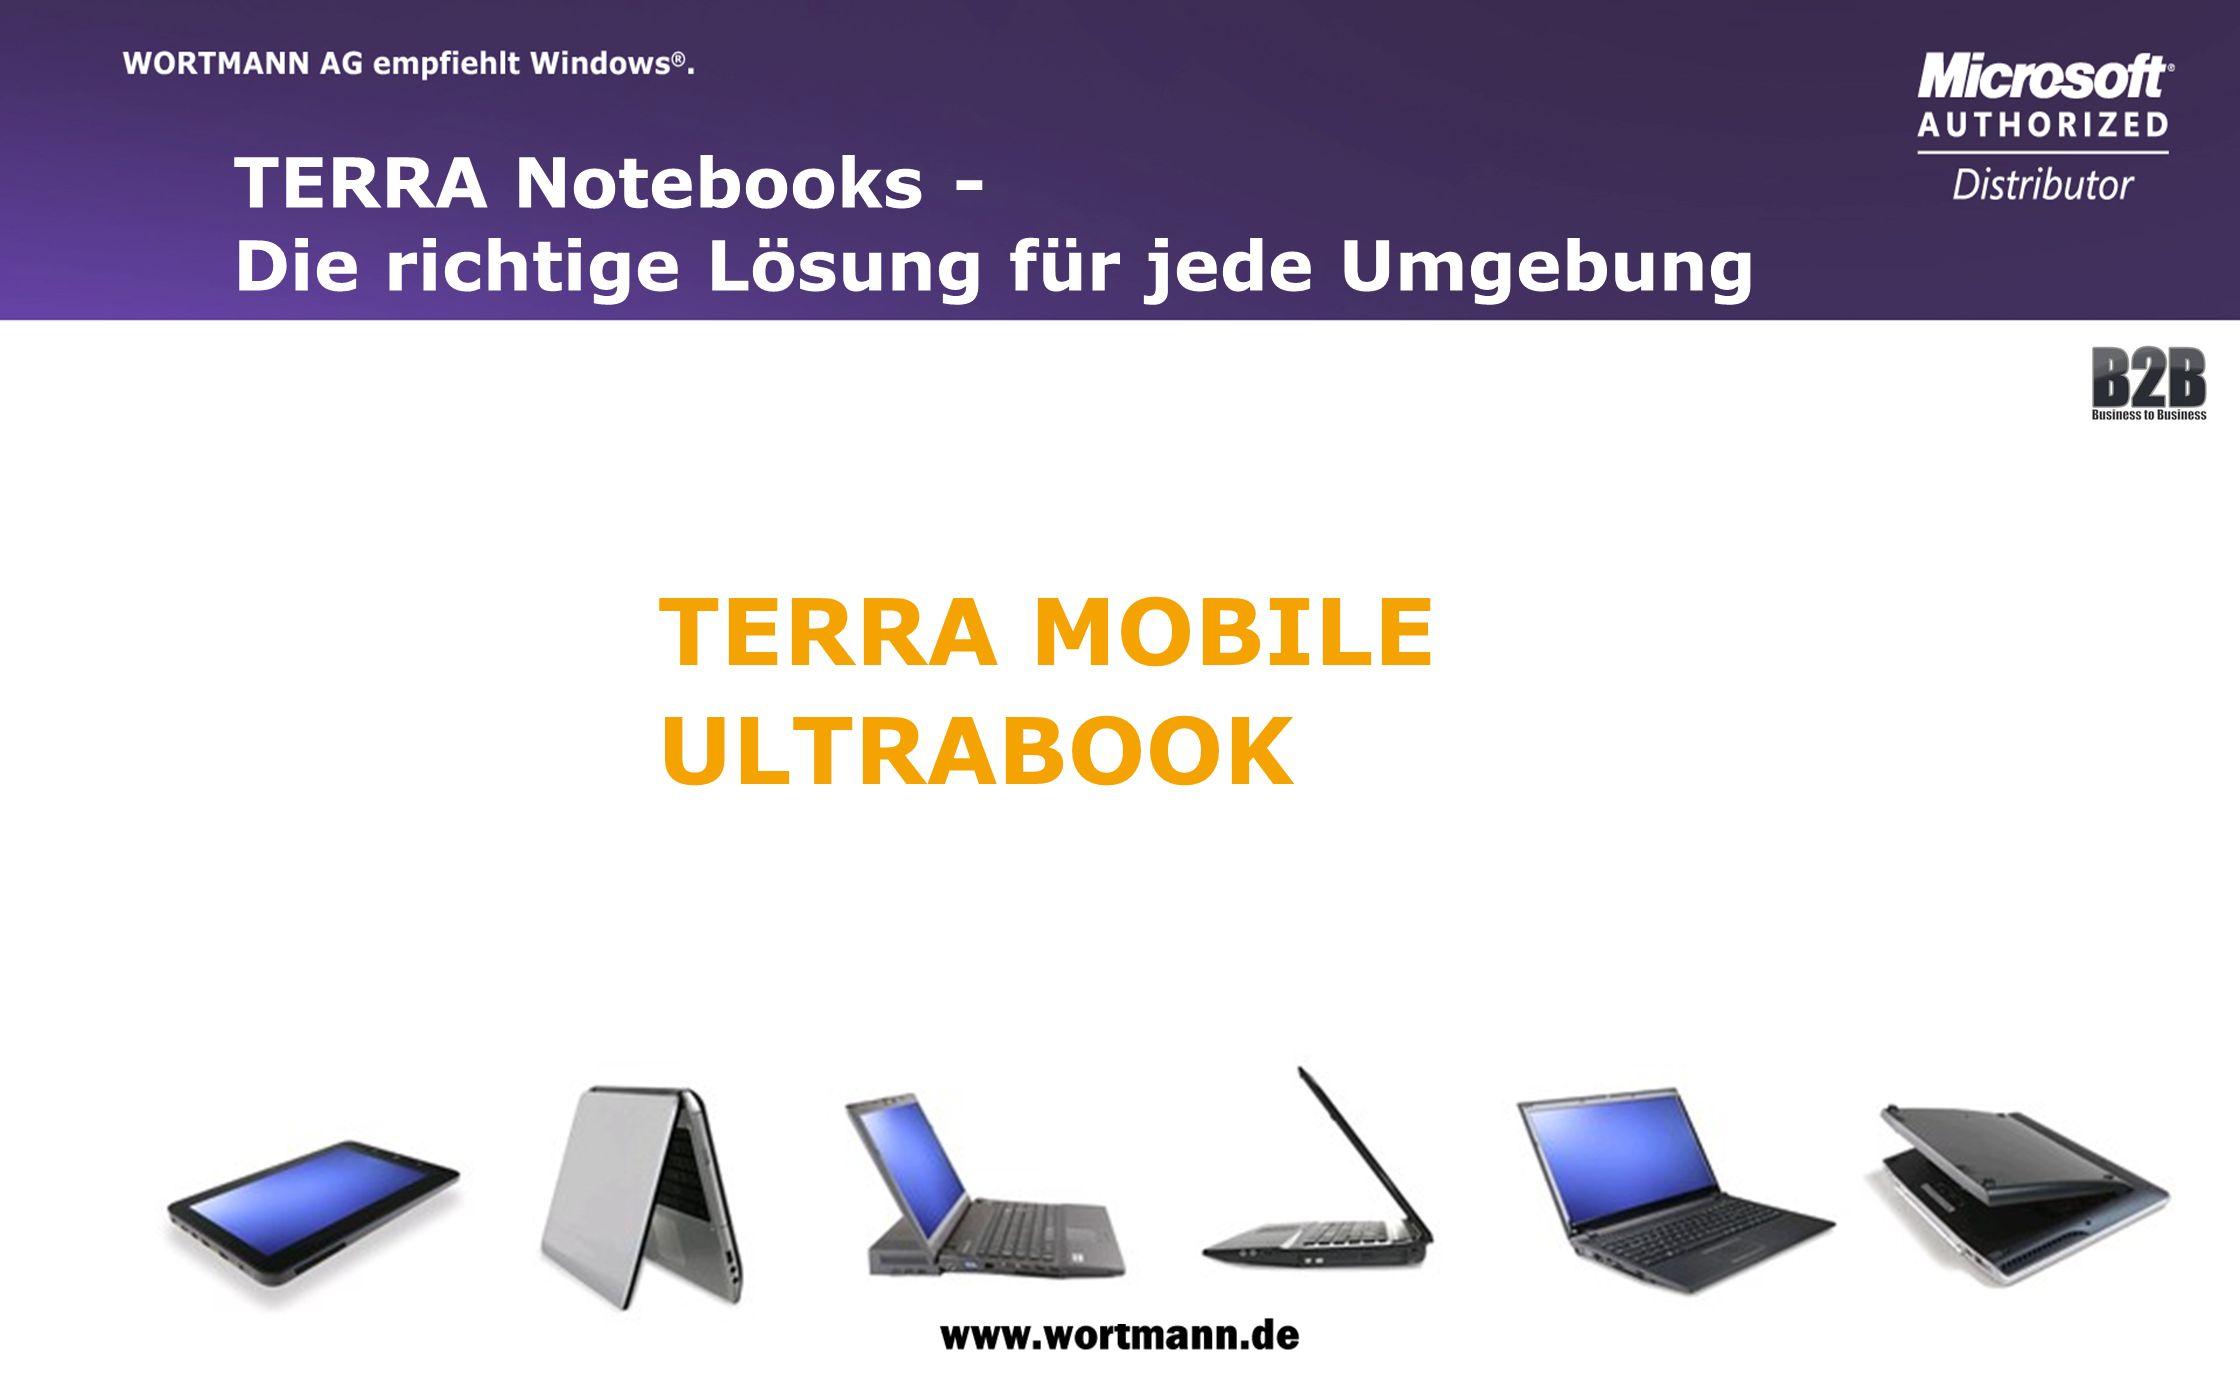 www.wortmann.de TERRA Notebooks - Die richtige Lösung für jede Umgebung TERRA MOBILE ULTRABOOK